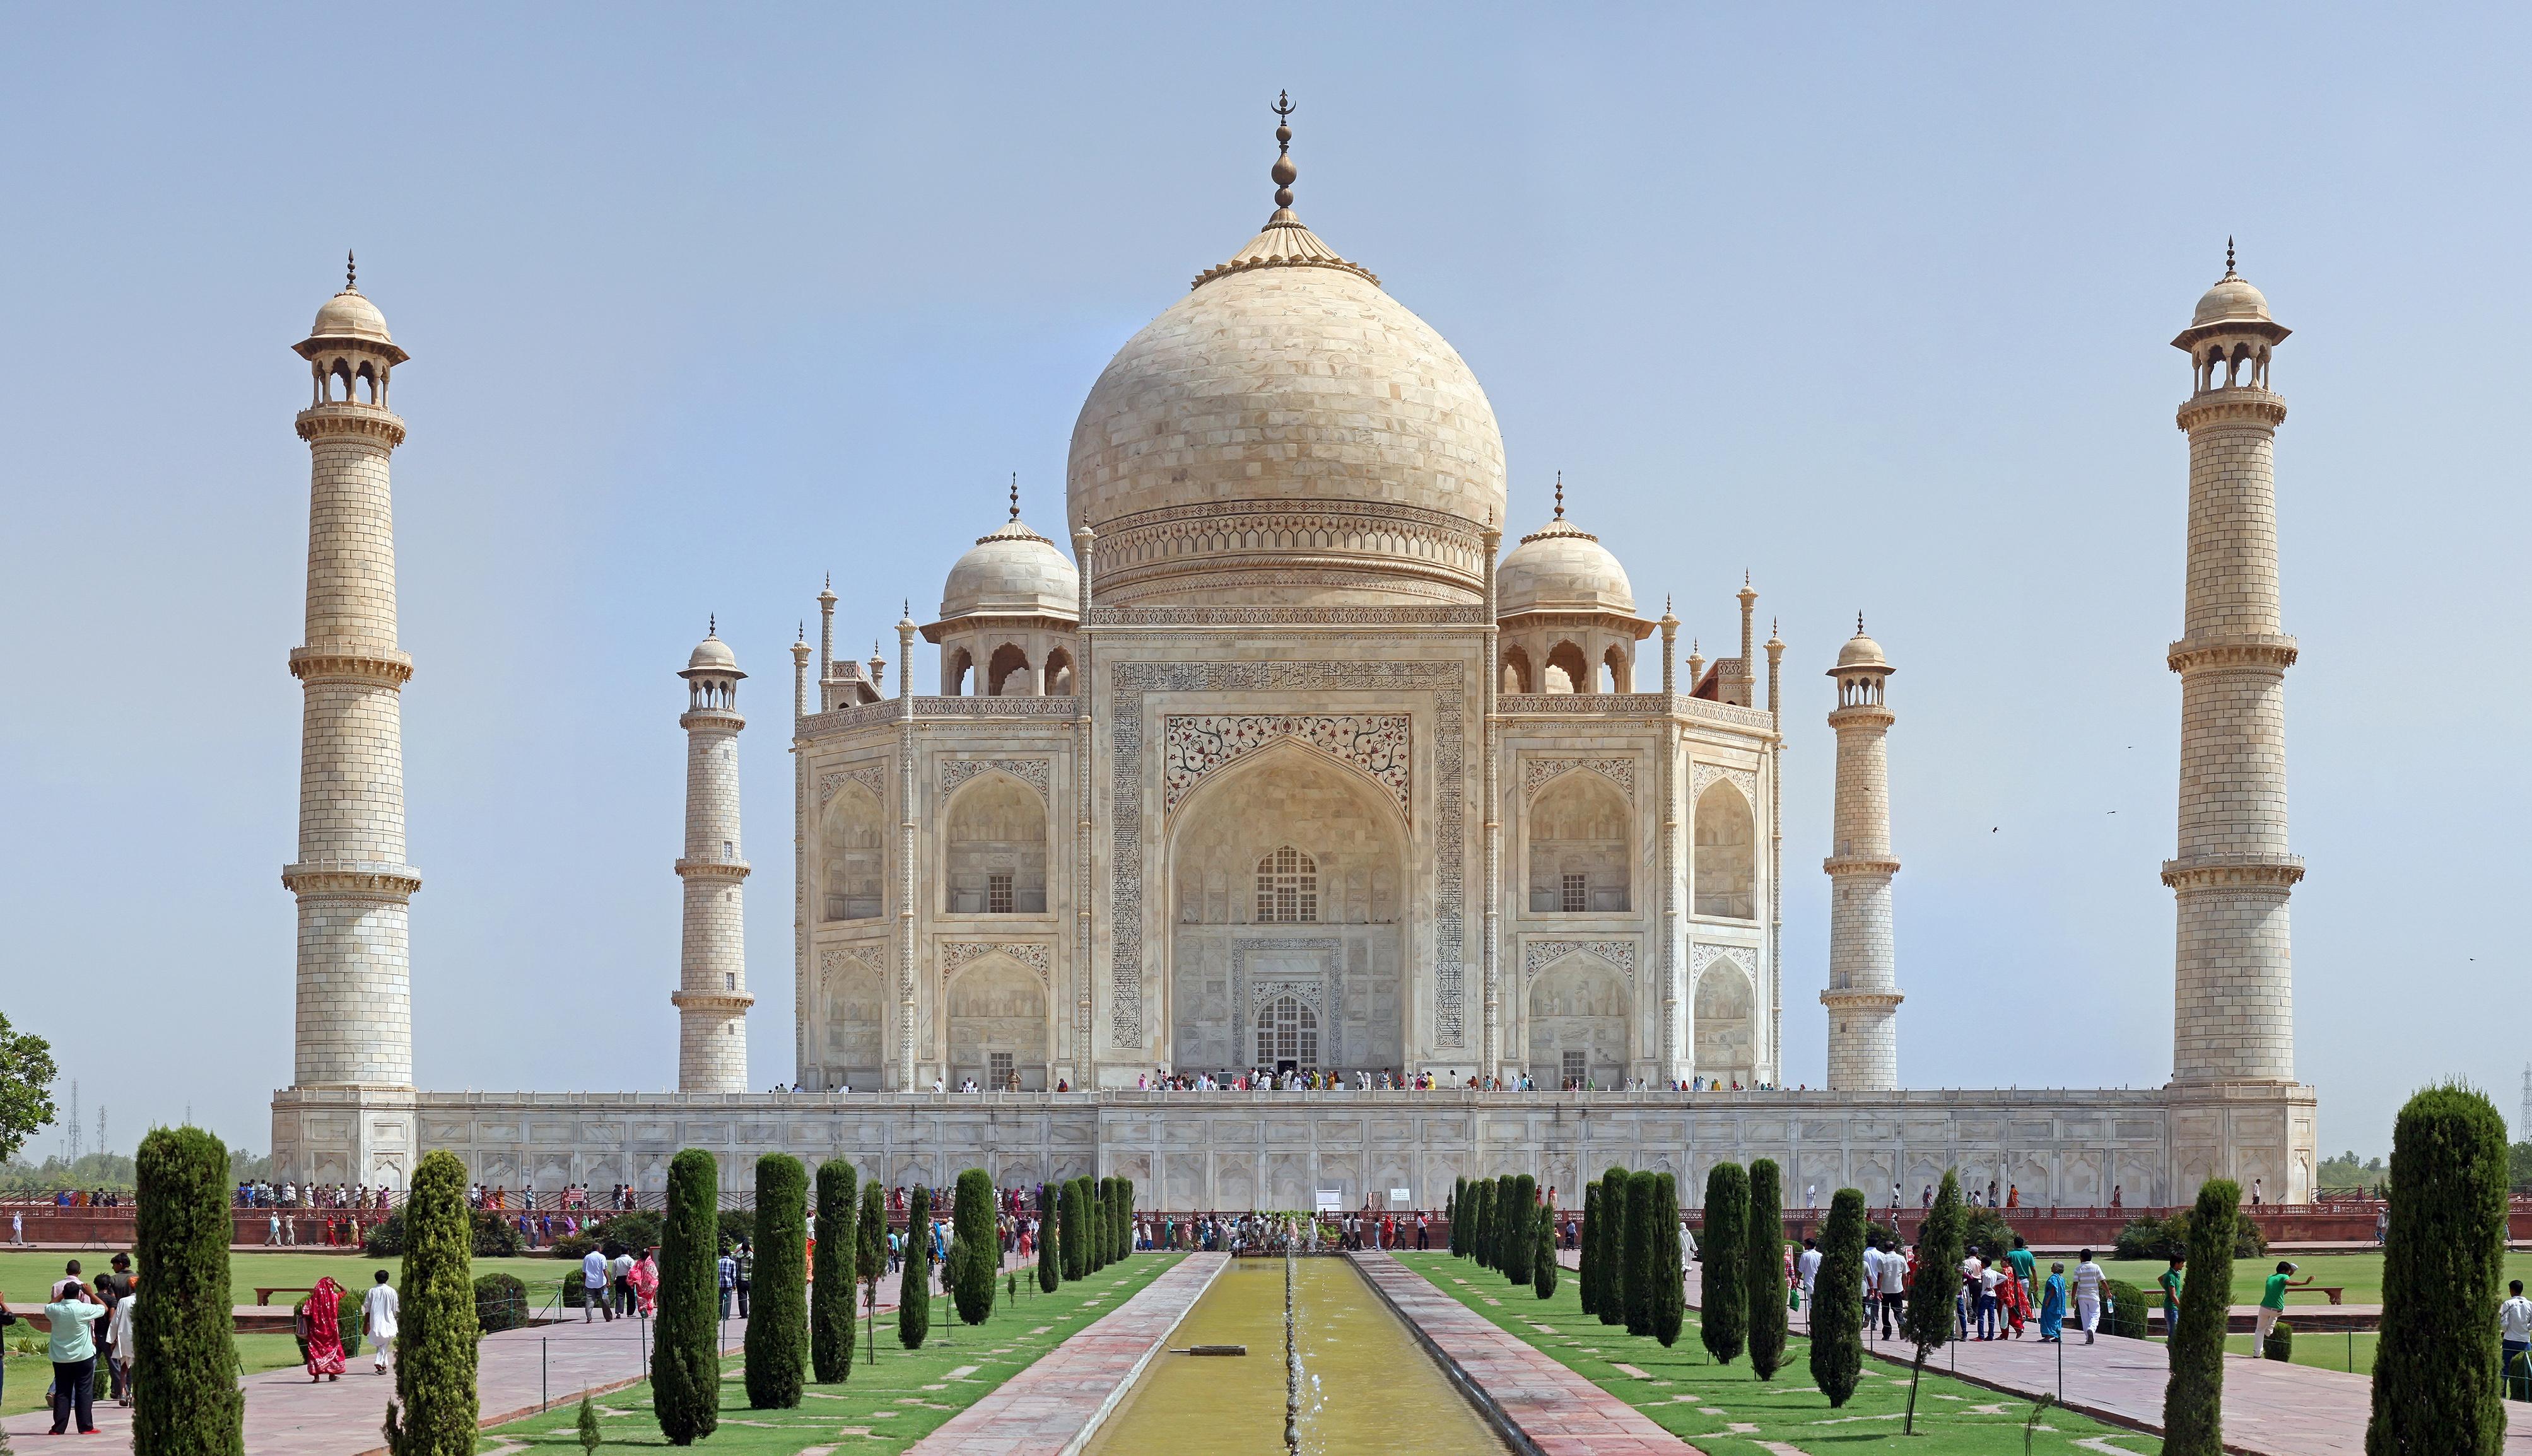 taj mahal india Taj mahal, india 31k likes the taj mahal is an ivory-white marble mausoleum on the south bank of the yamuna river in the indian city of agra.